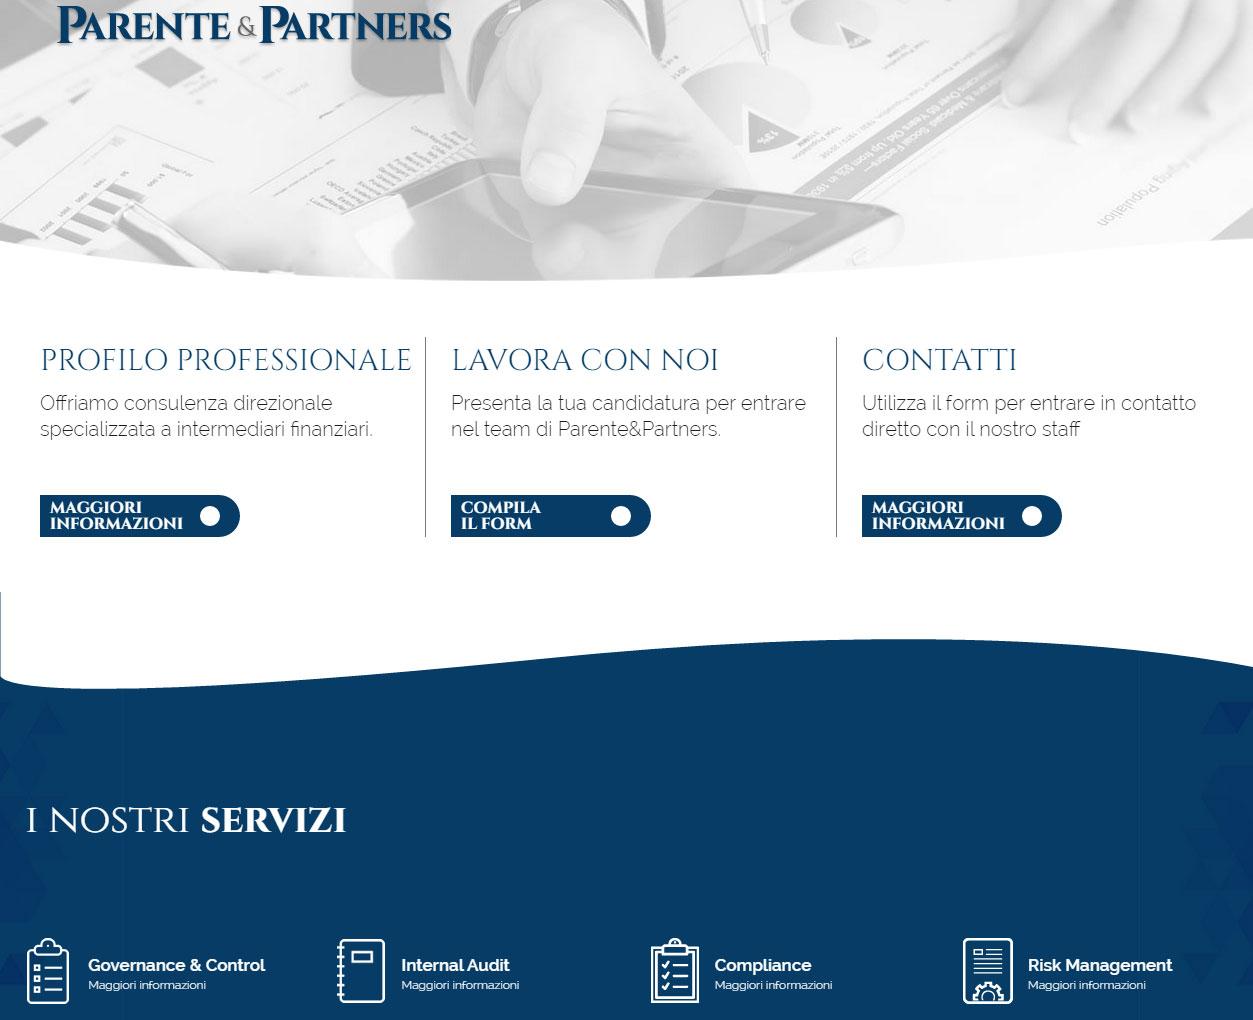 Parente & Partners, consulenza per intermediari finanziari